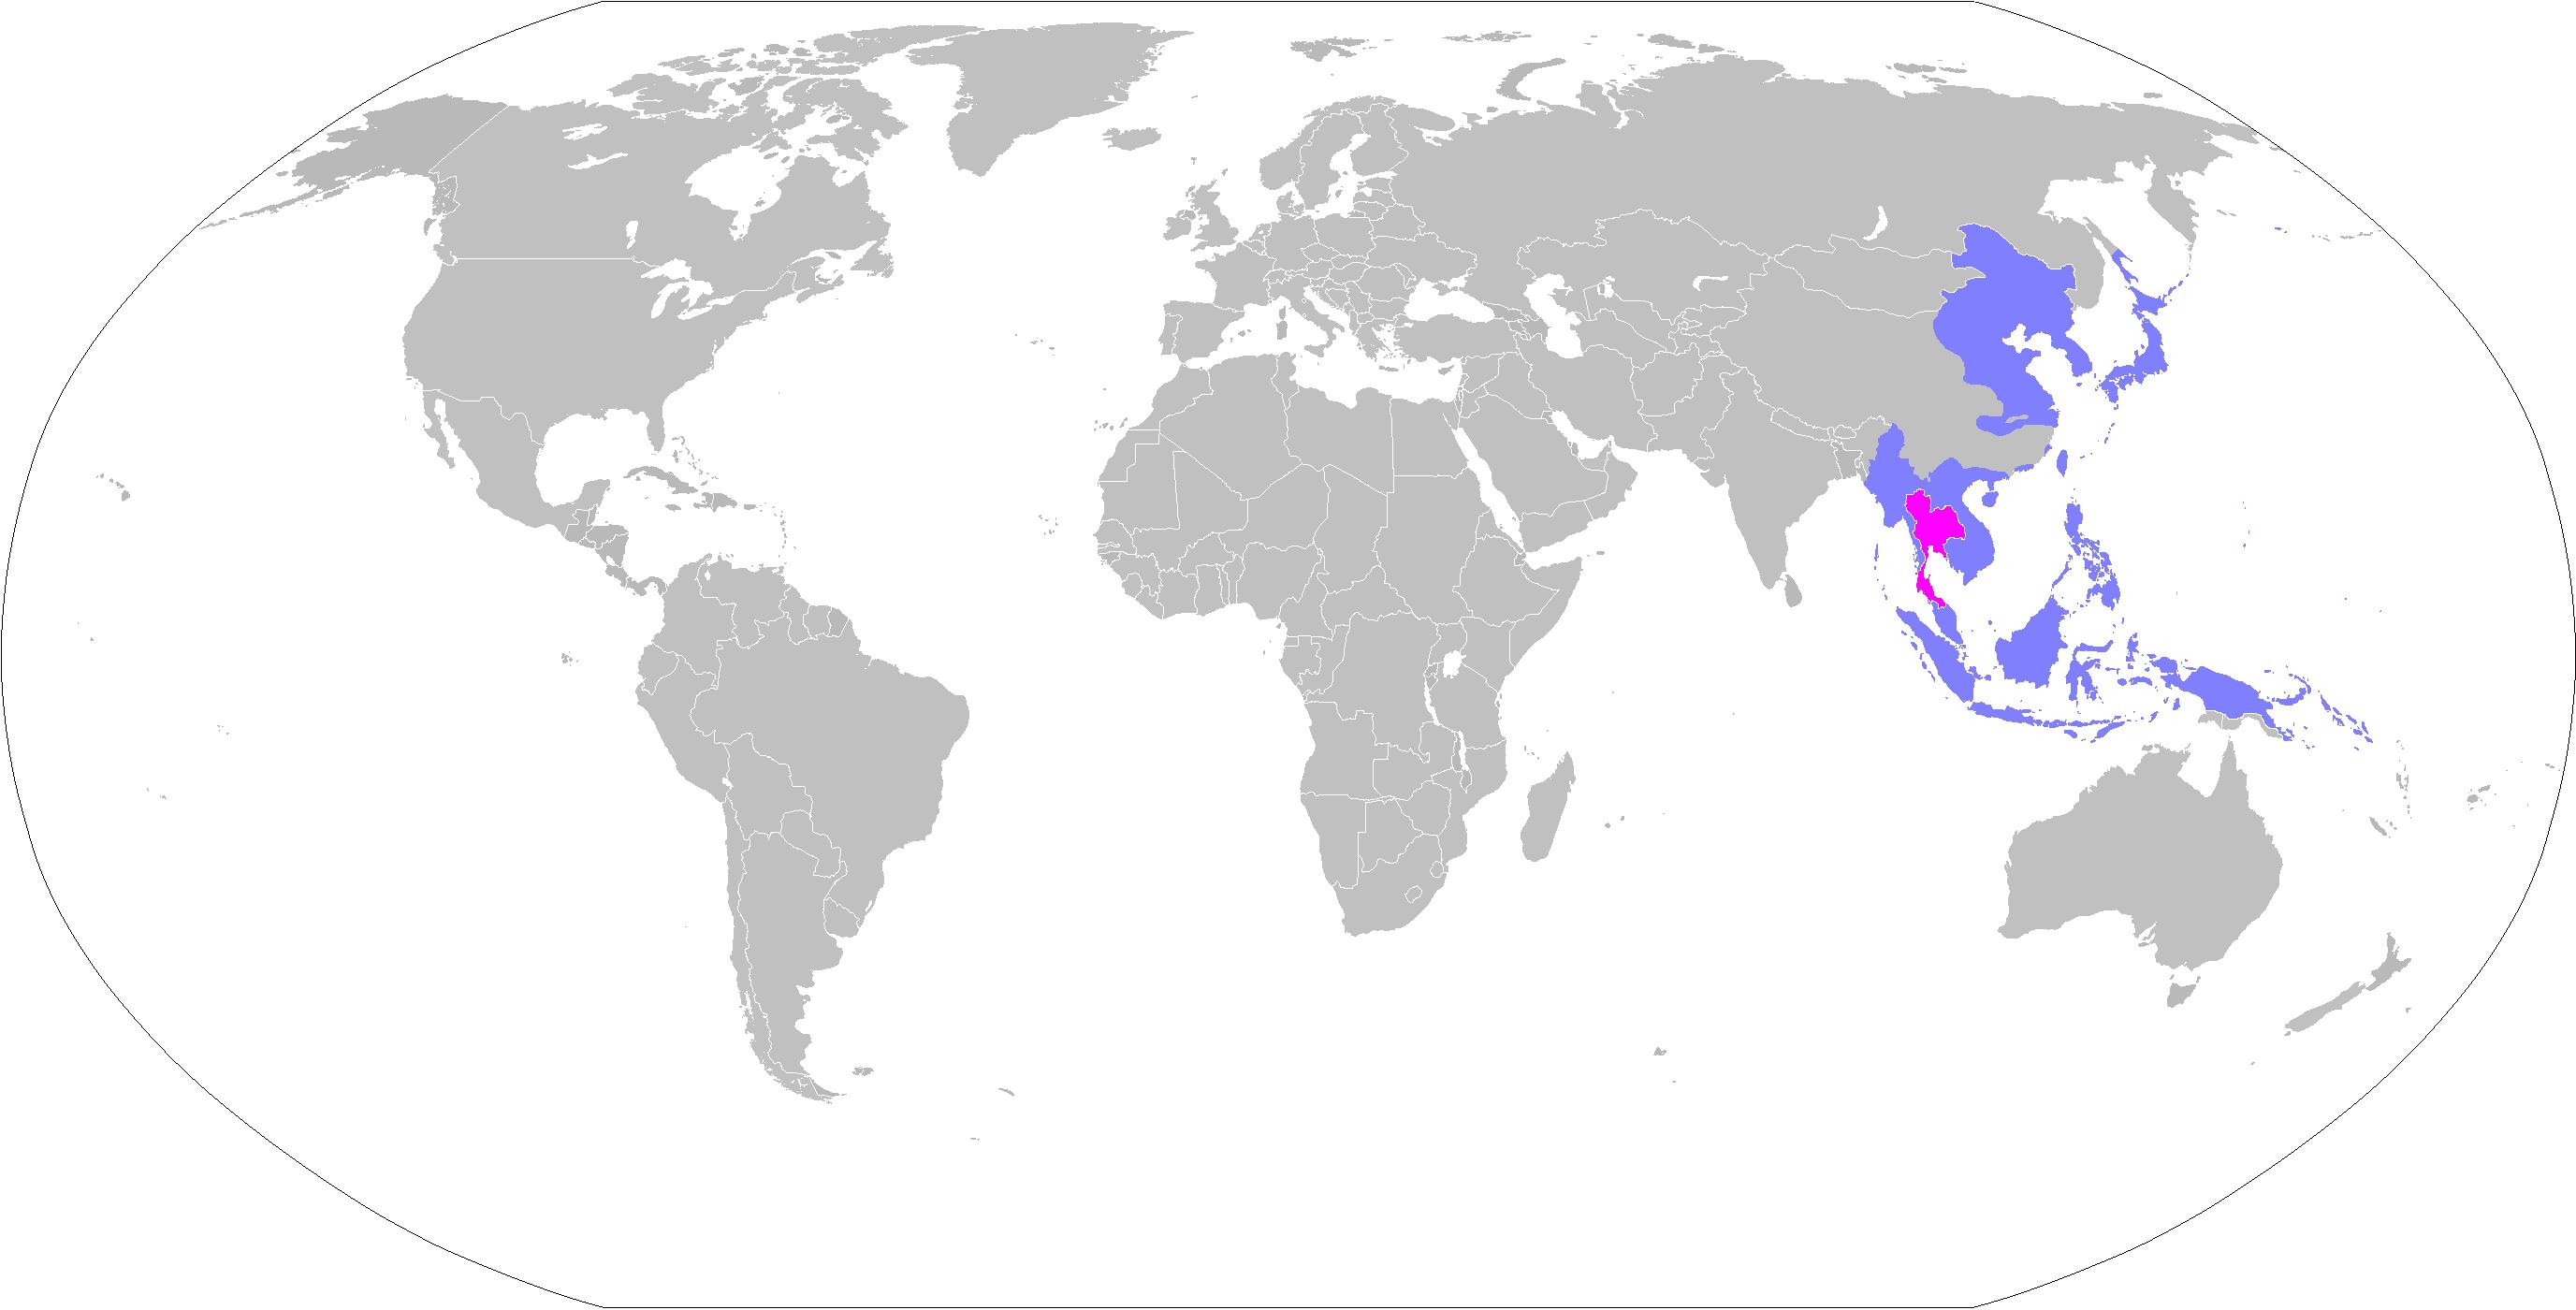 File:Map world.png - Wikimedia Commons